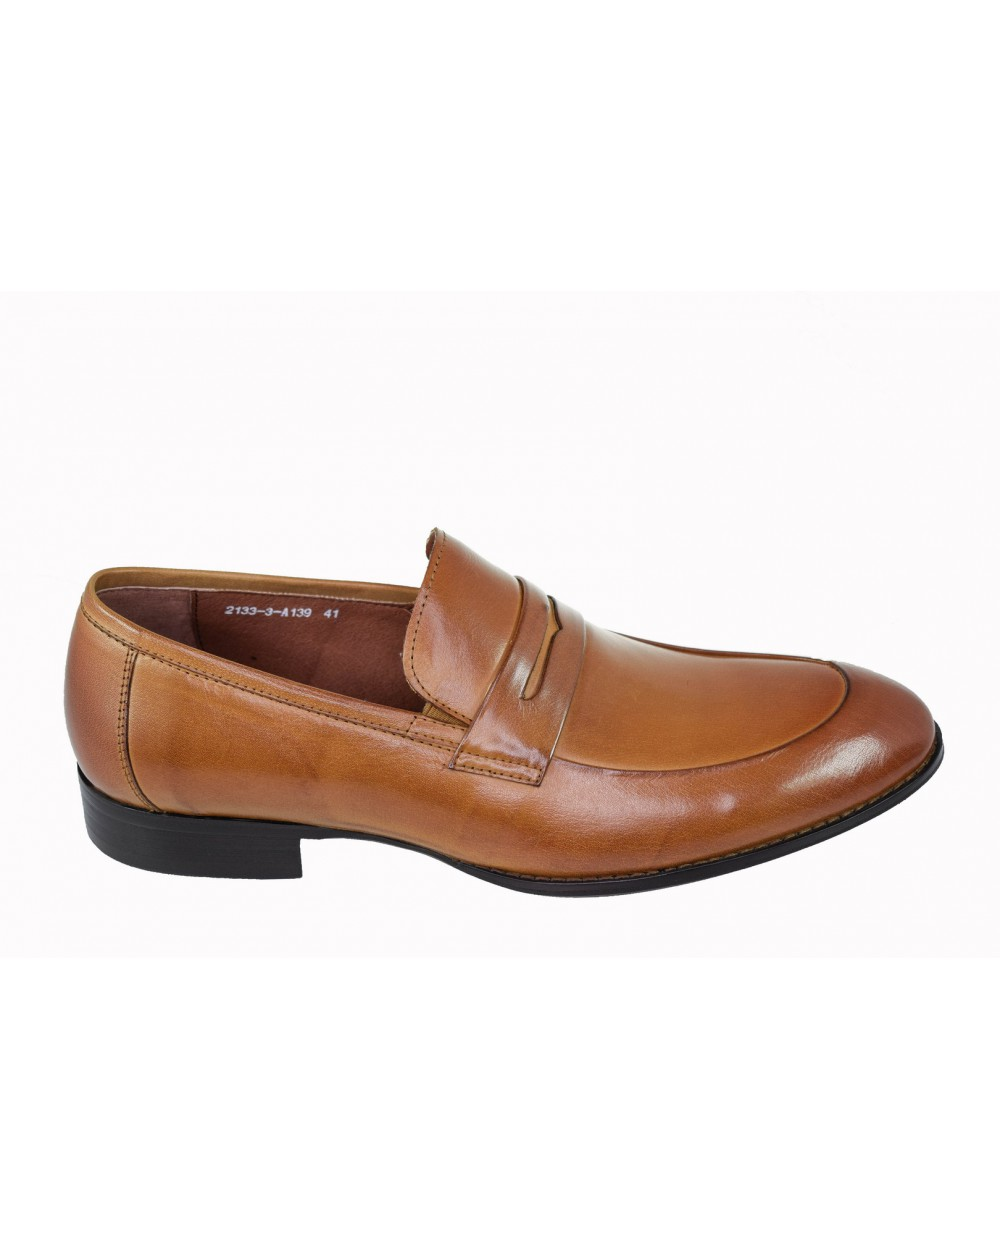 Półbuty BROOMAN - 2133-3-A139 brązowy